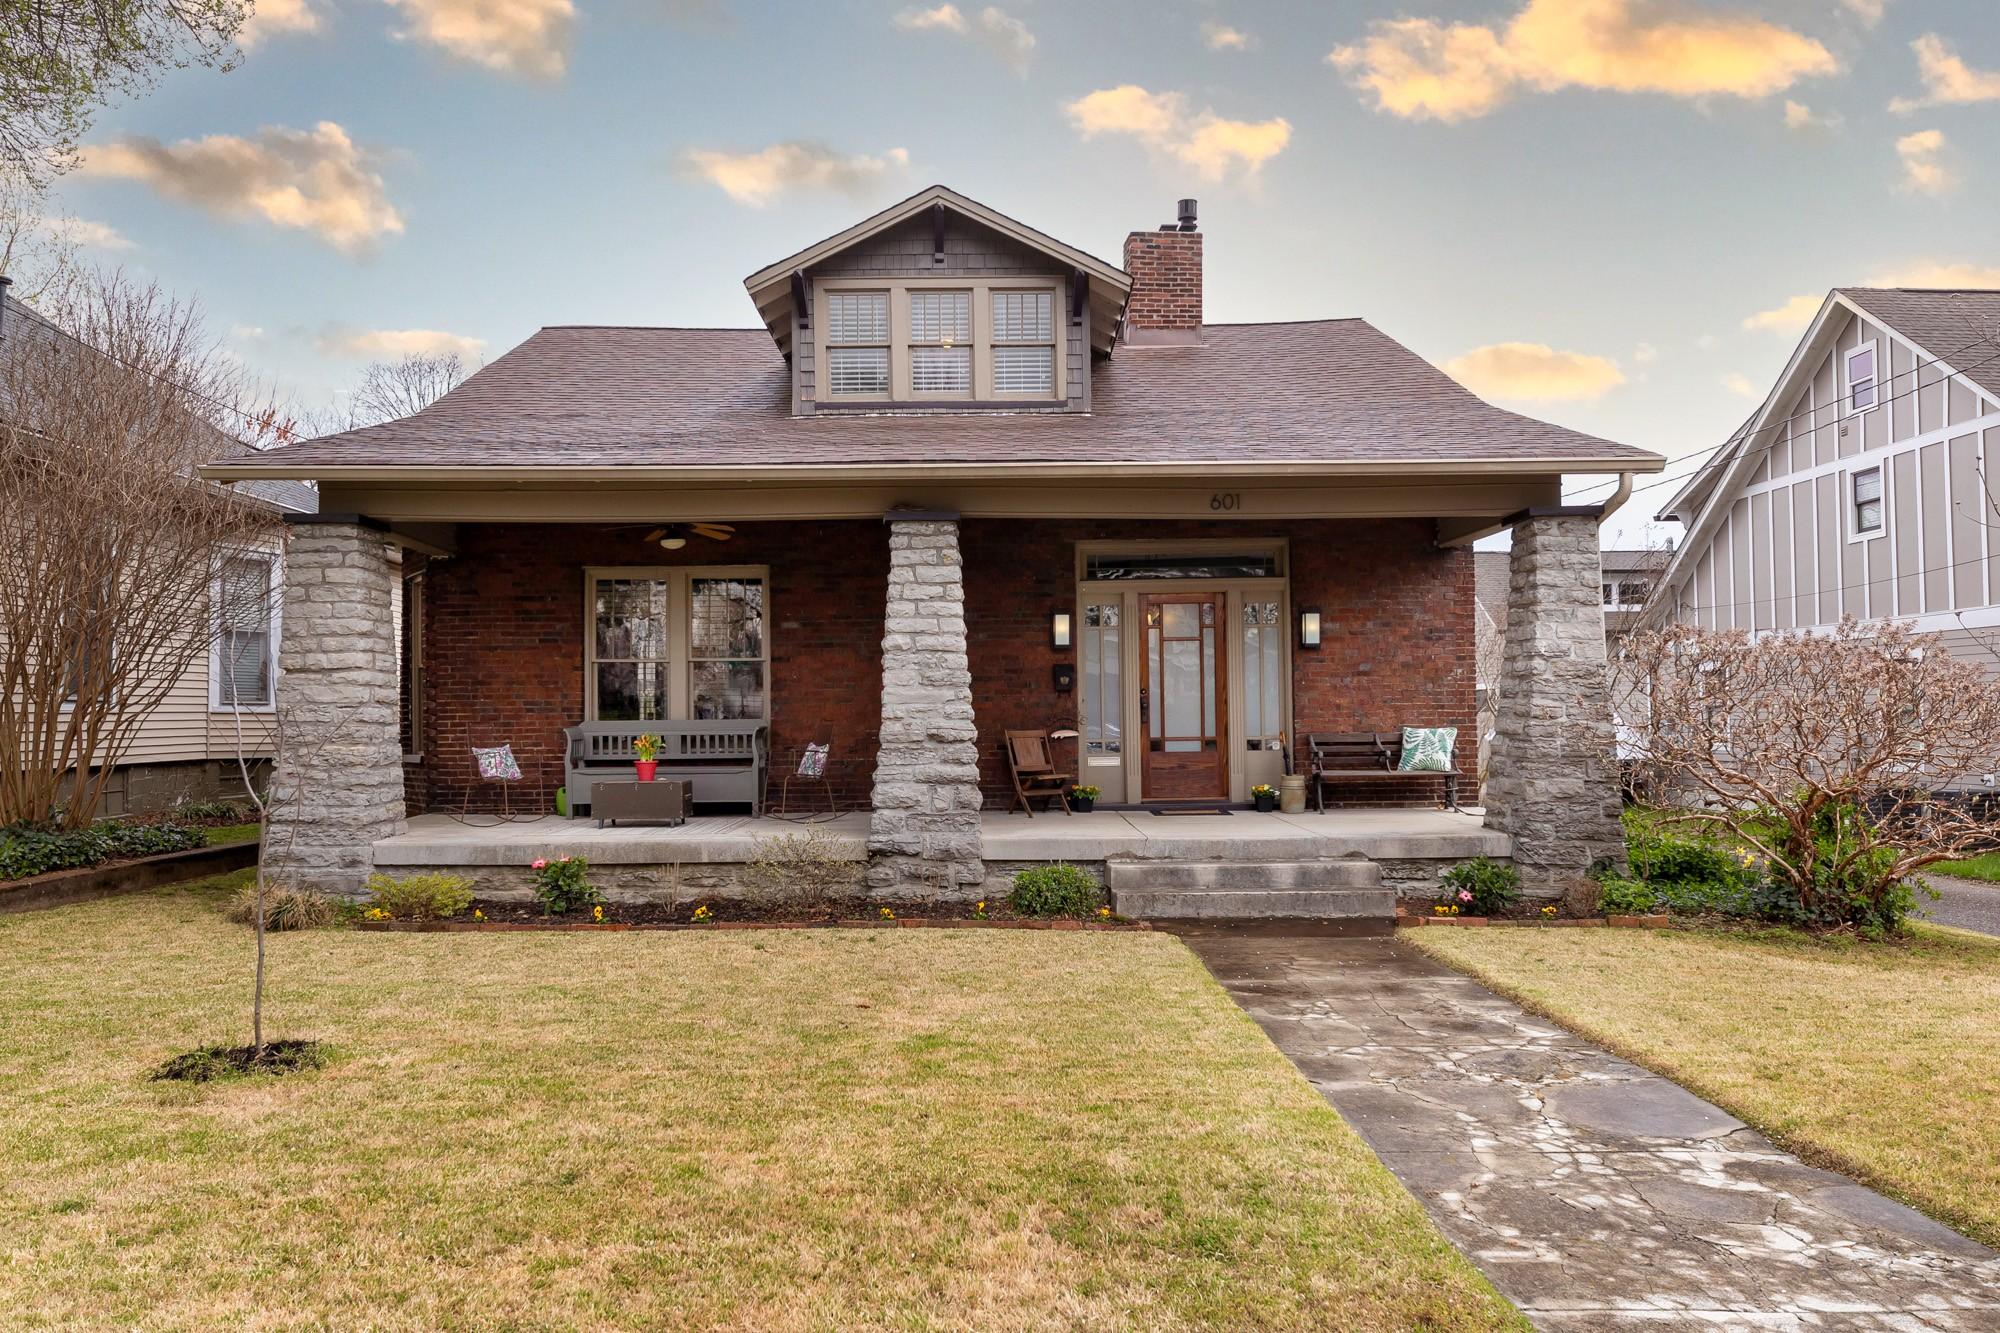 601 N 16th St Property Photo - Nashville, TN real estate listing